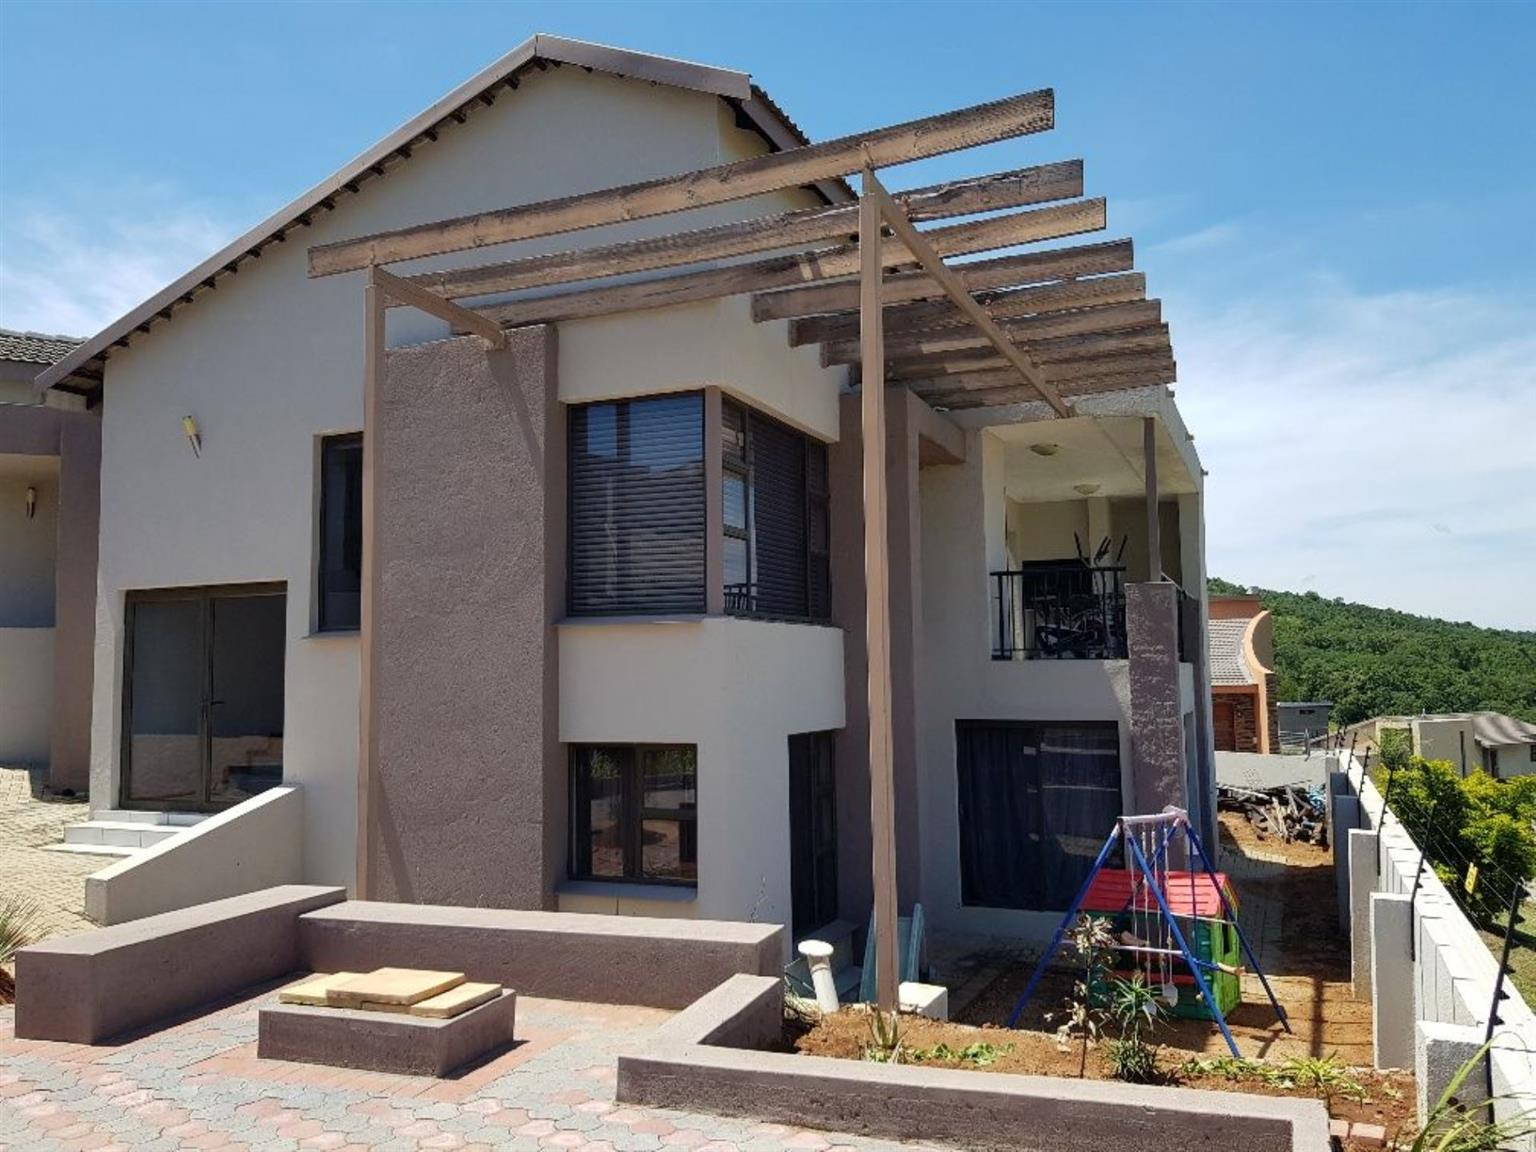 House Rental Monthly in Drum Rock